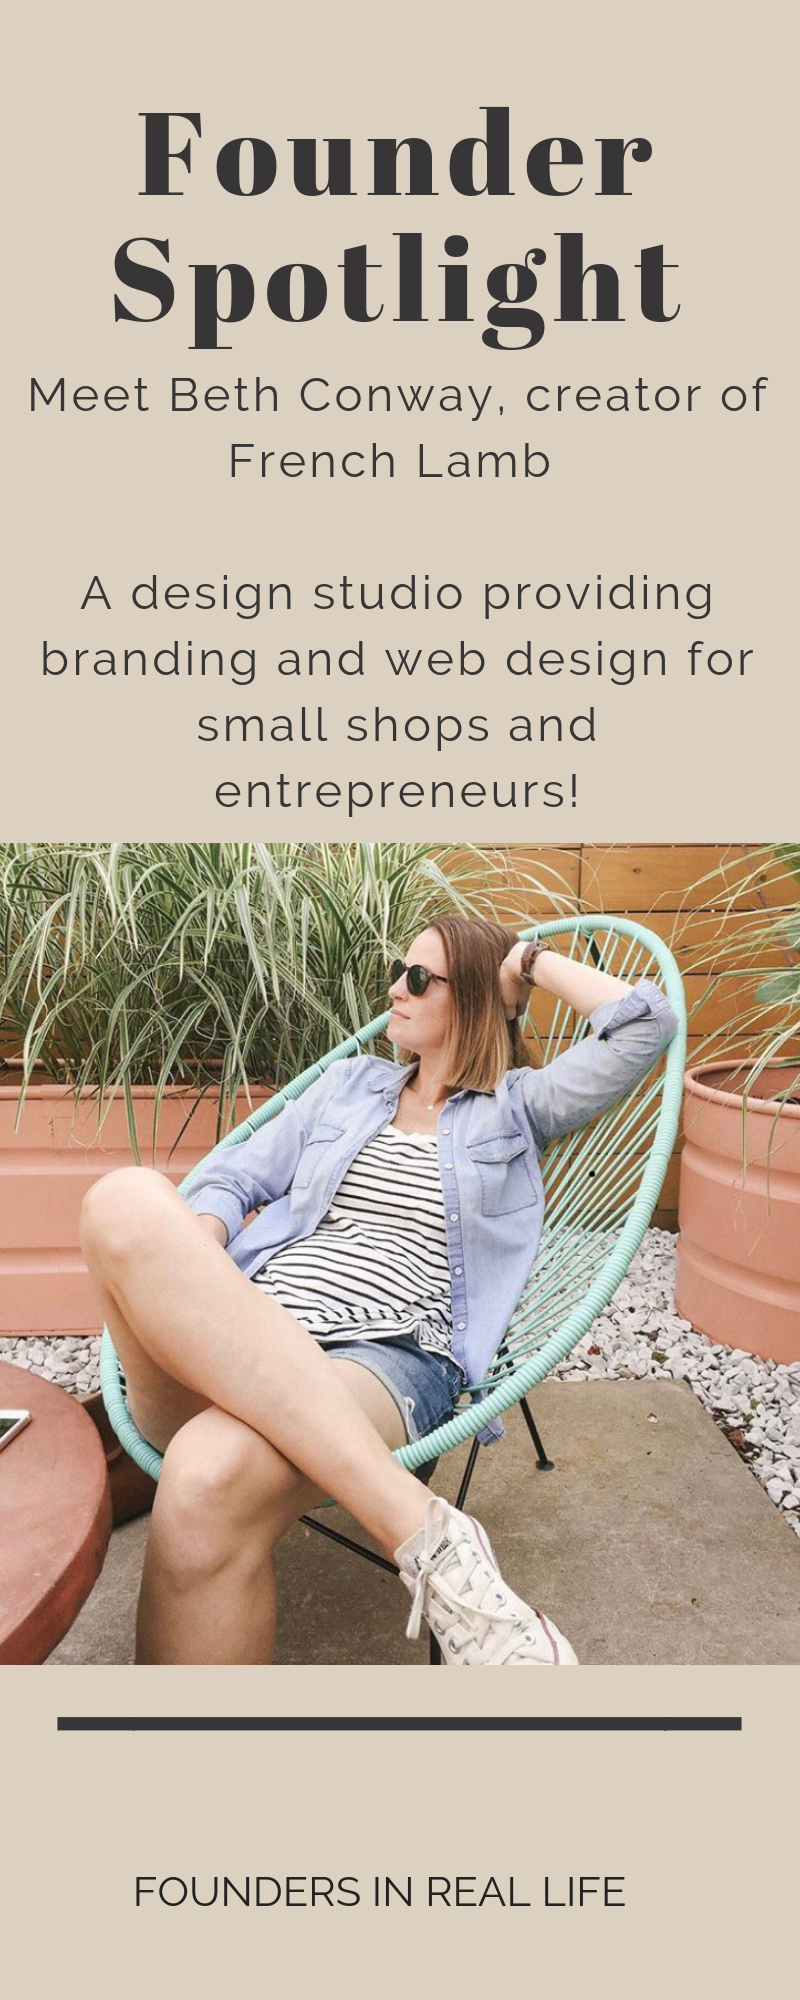 French Lamb - Design Studio featuring Branding and Web Design